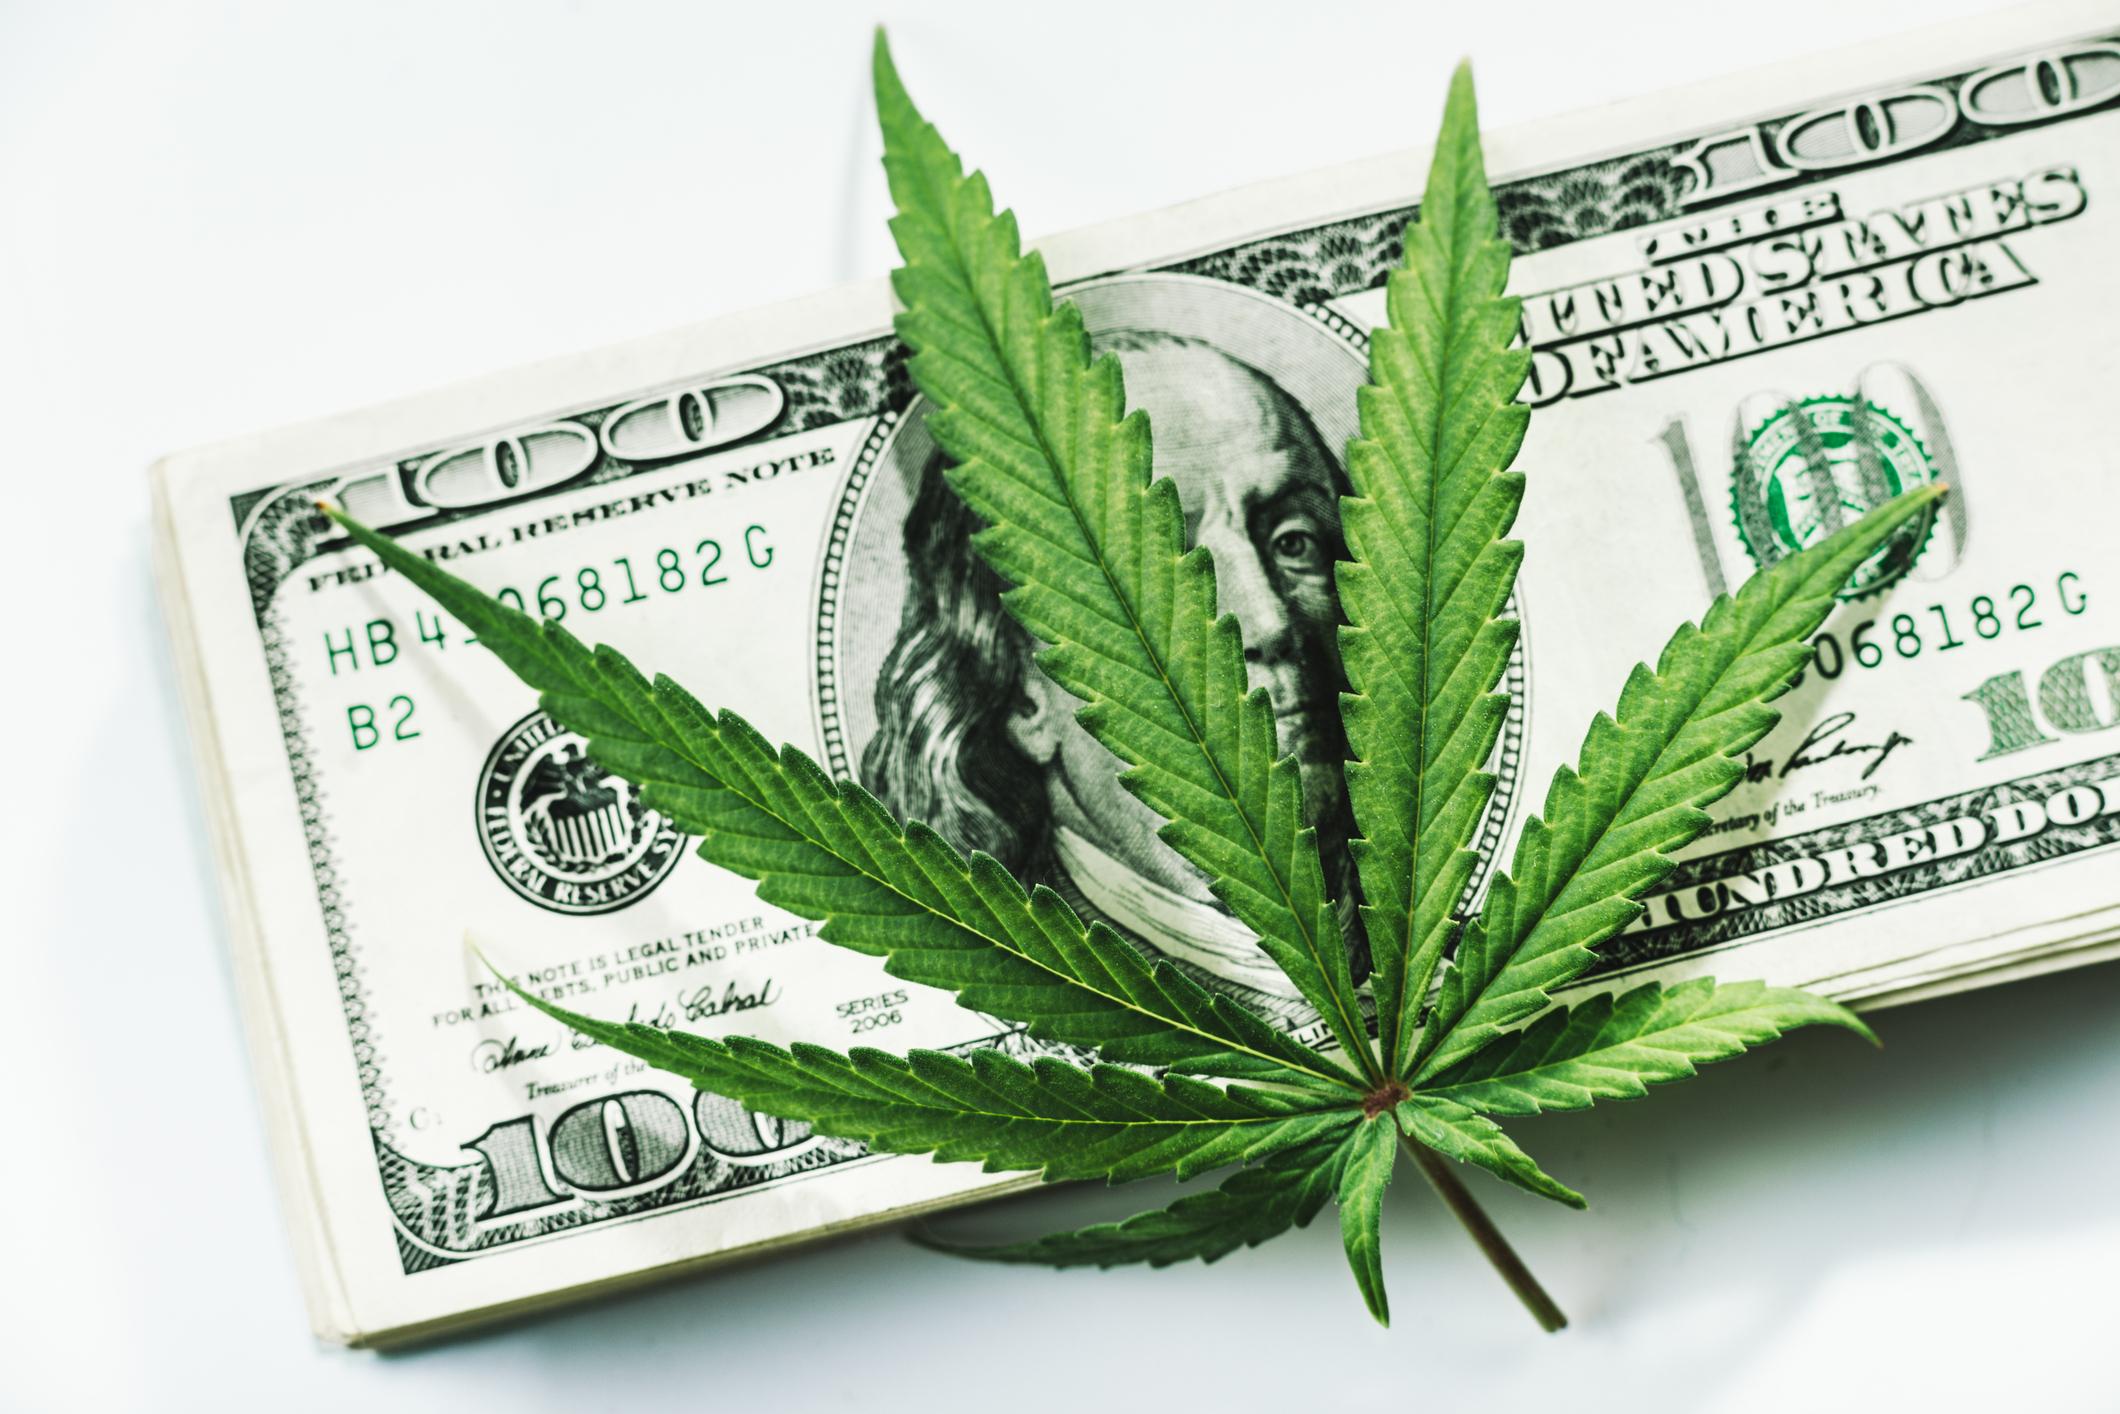 Marijuana leaf on top of stack of $100 bills.